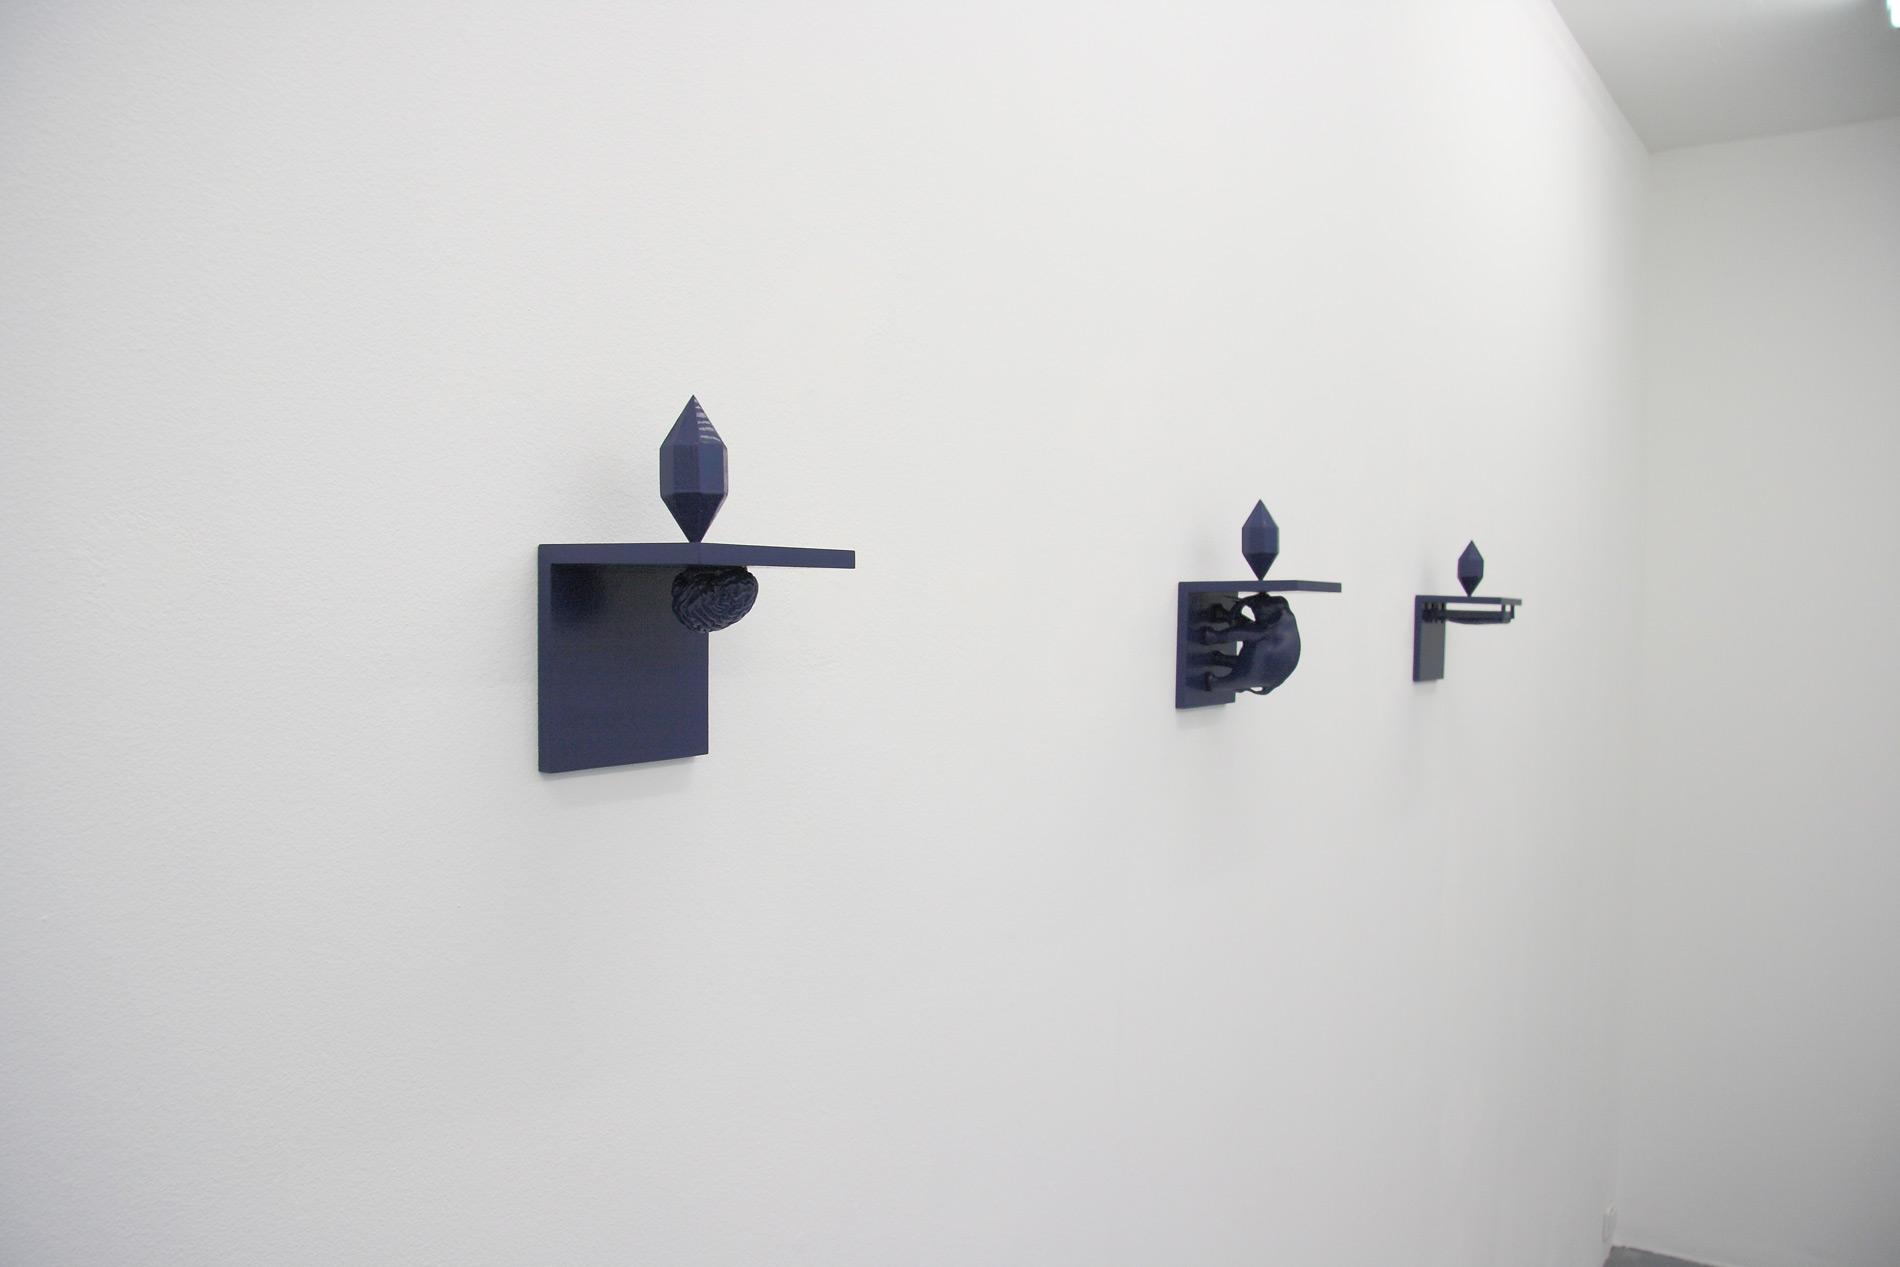 Michael Göbel - Diamonds are forever, 2011